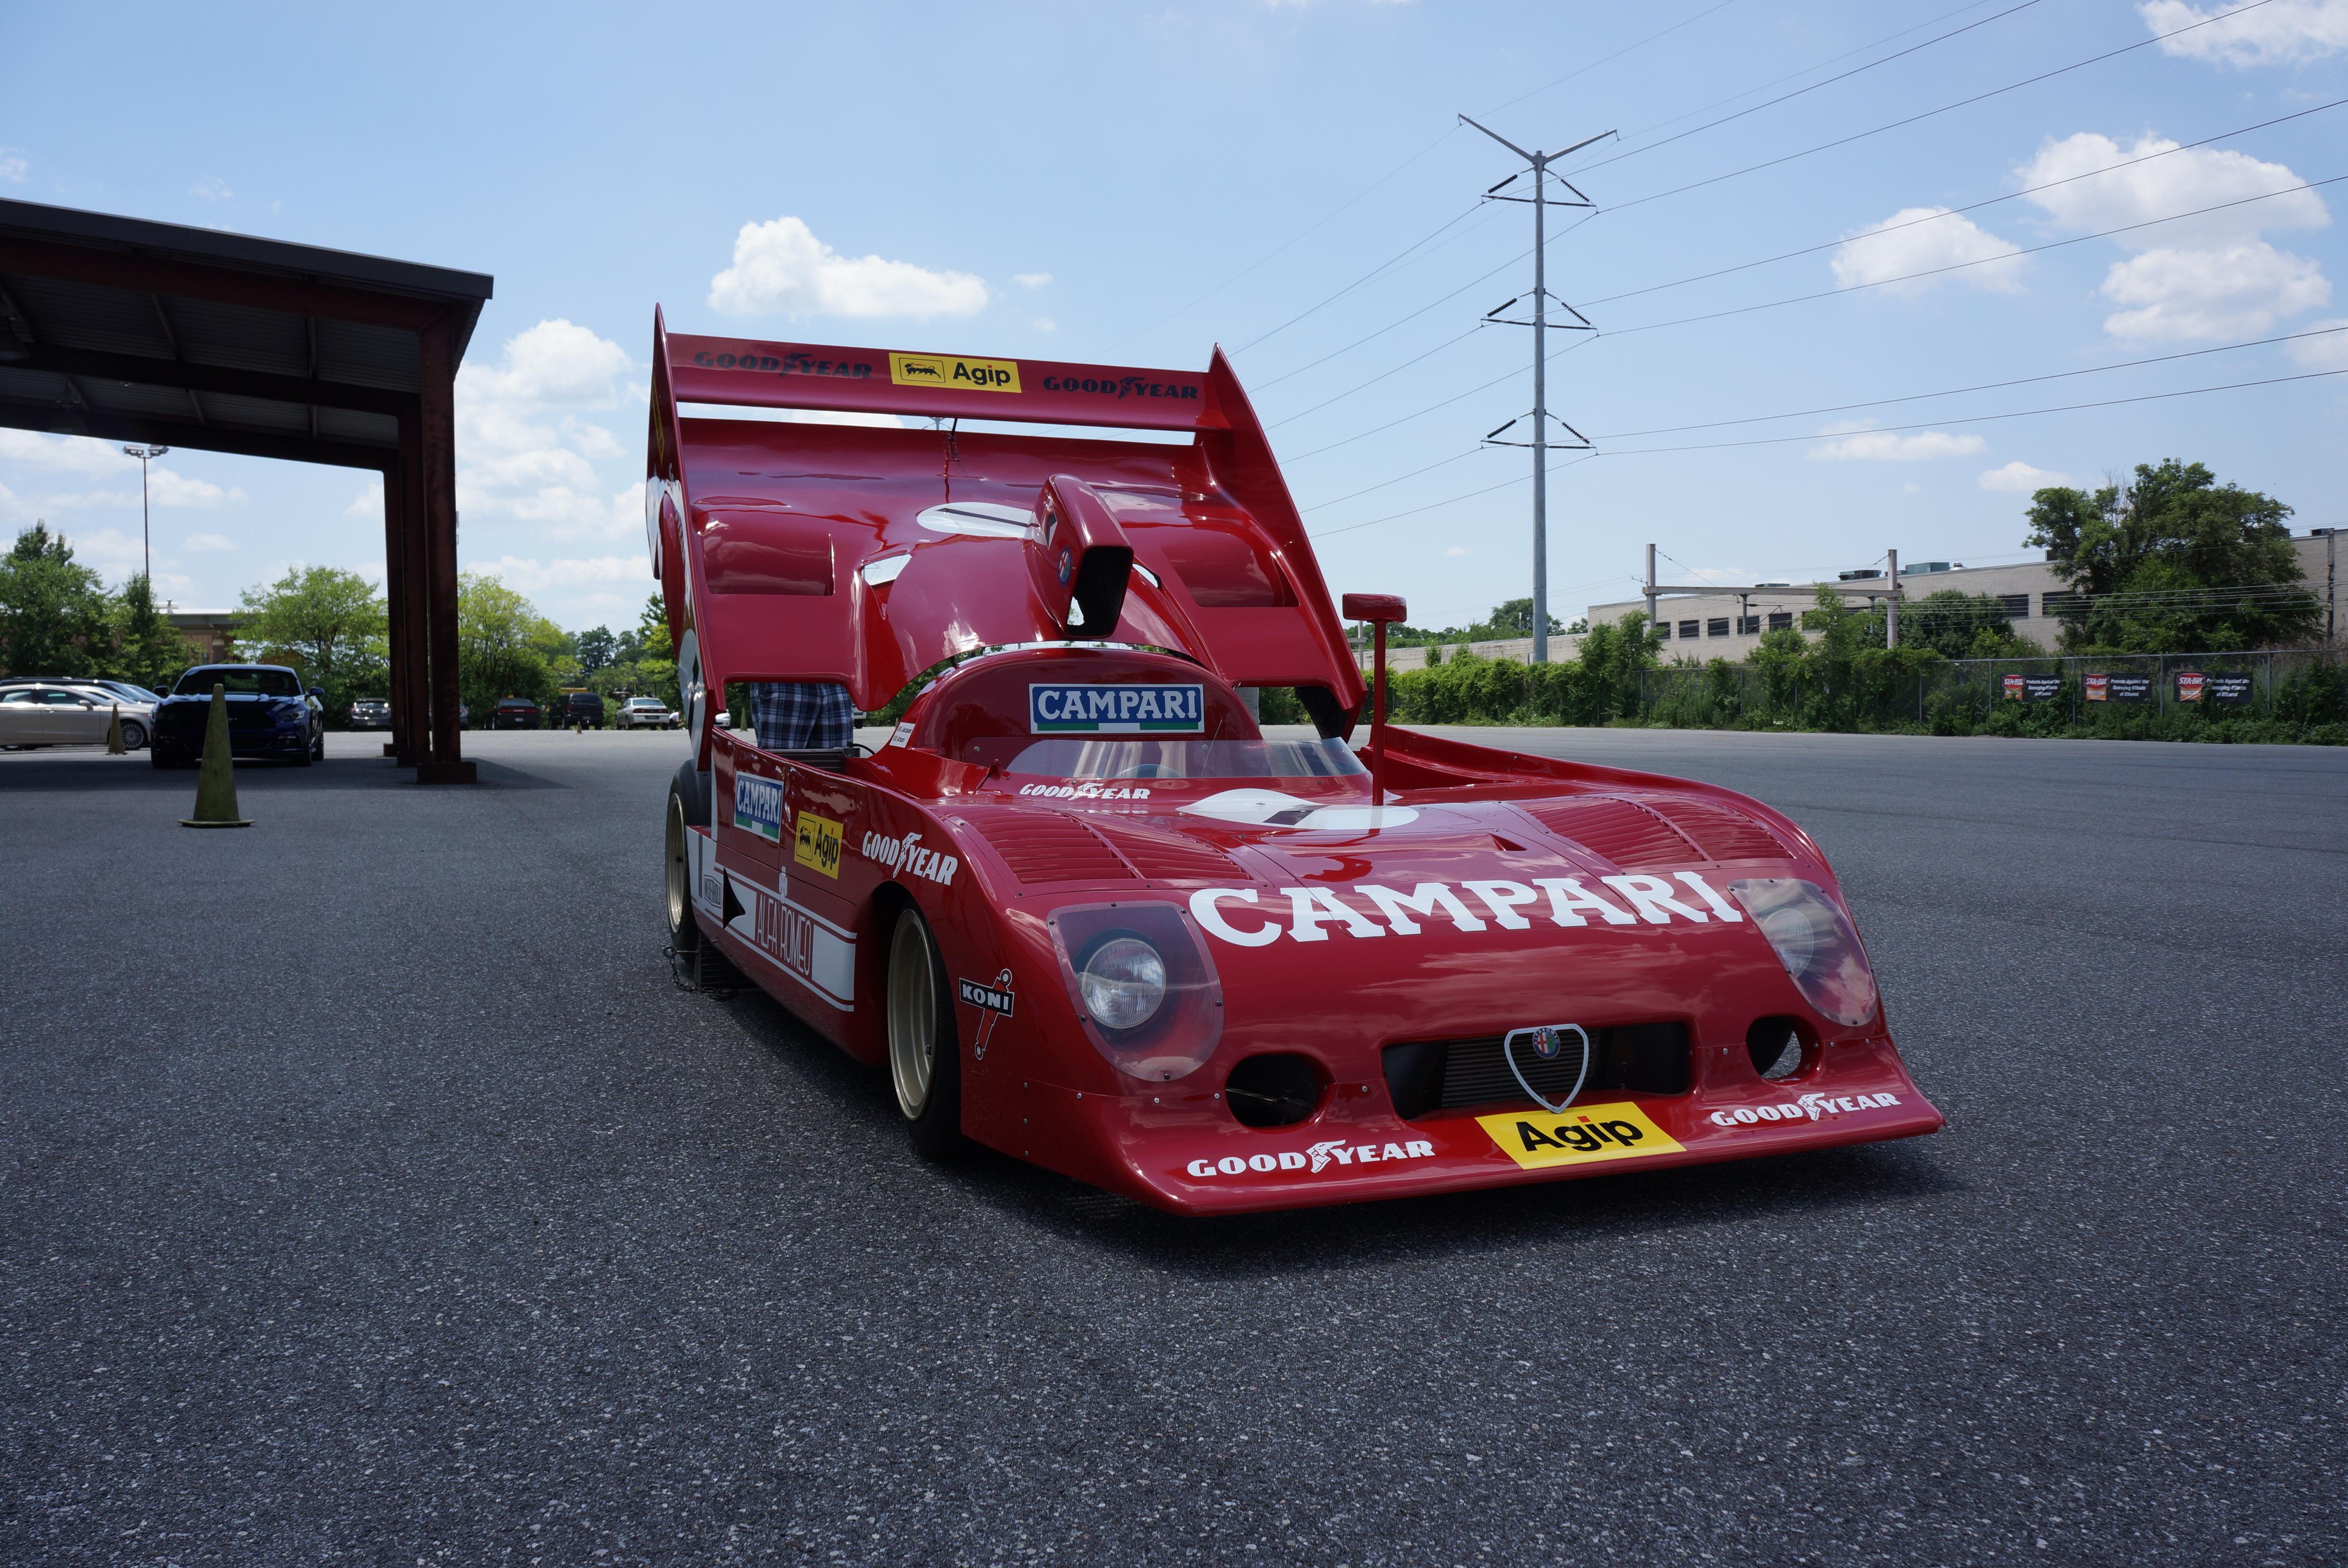 The shape screams '70s race car